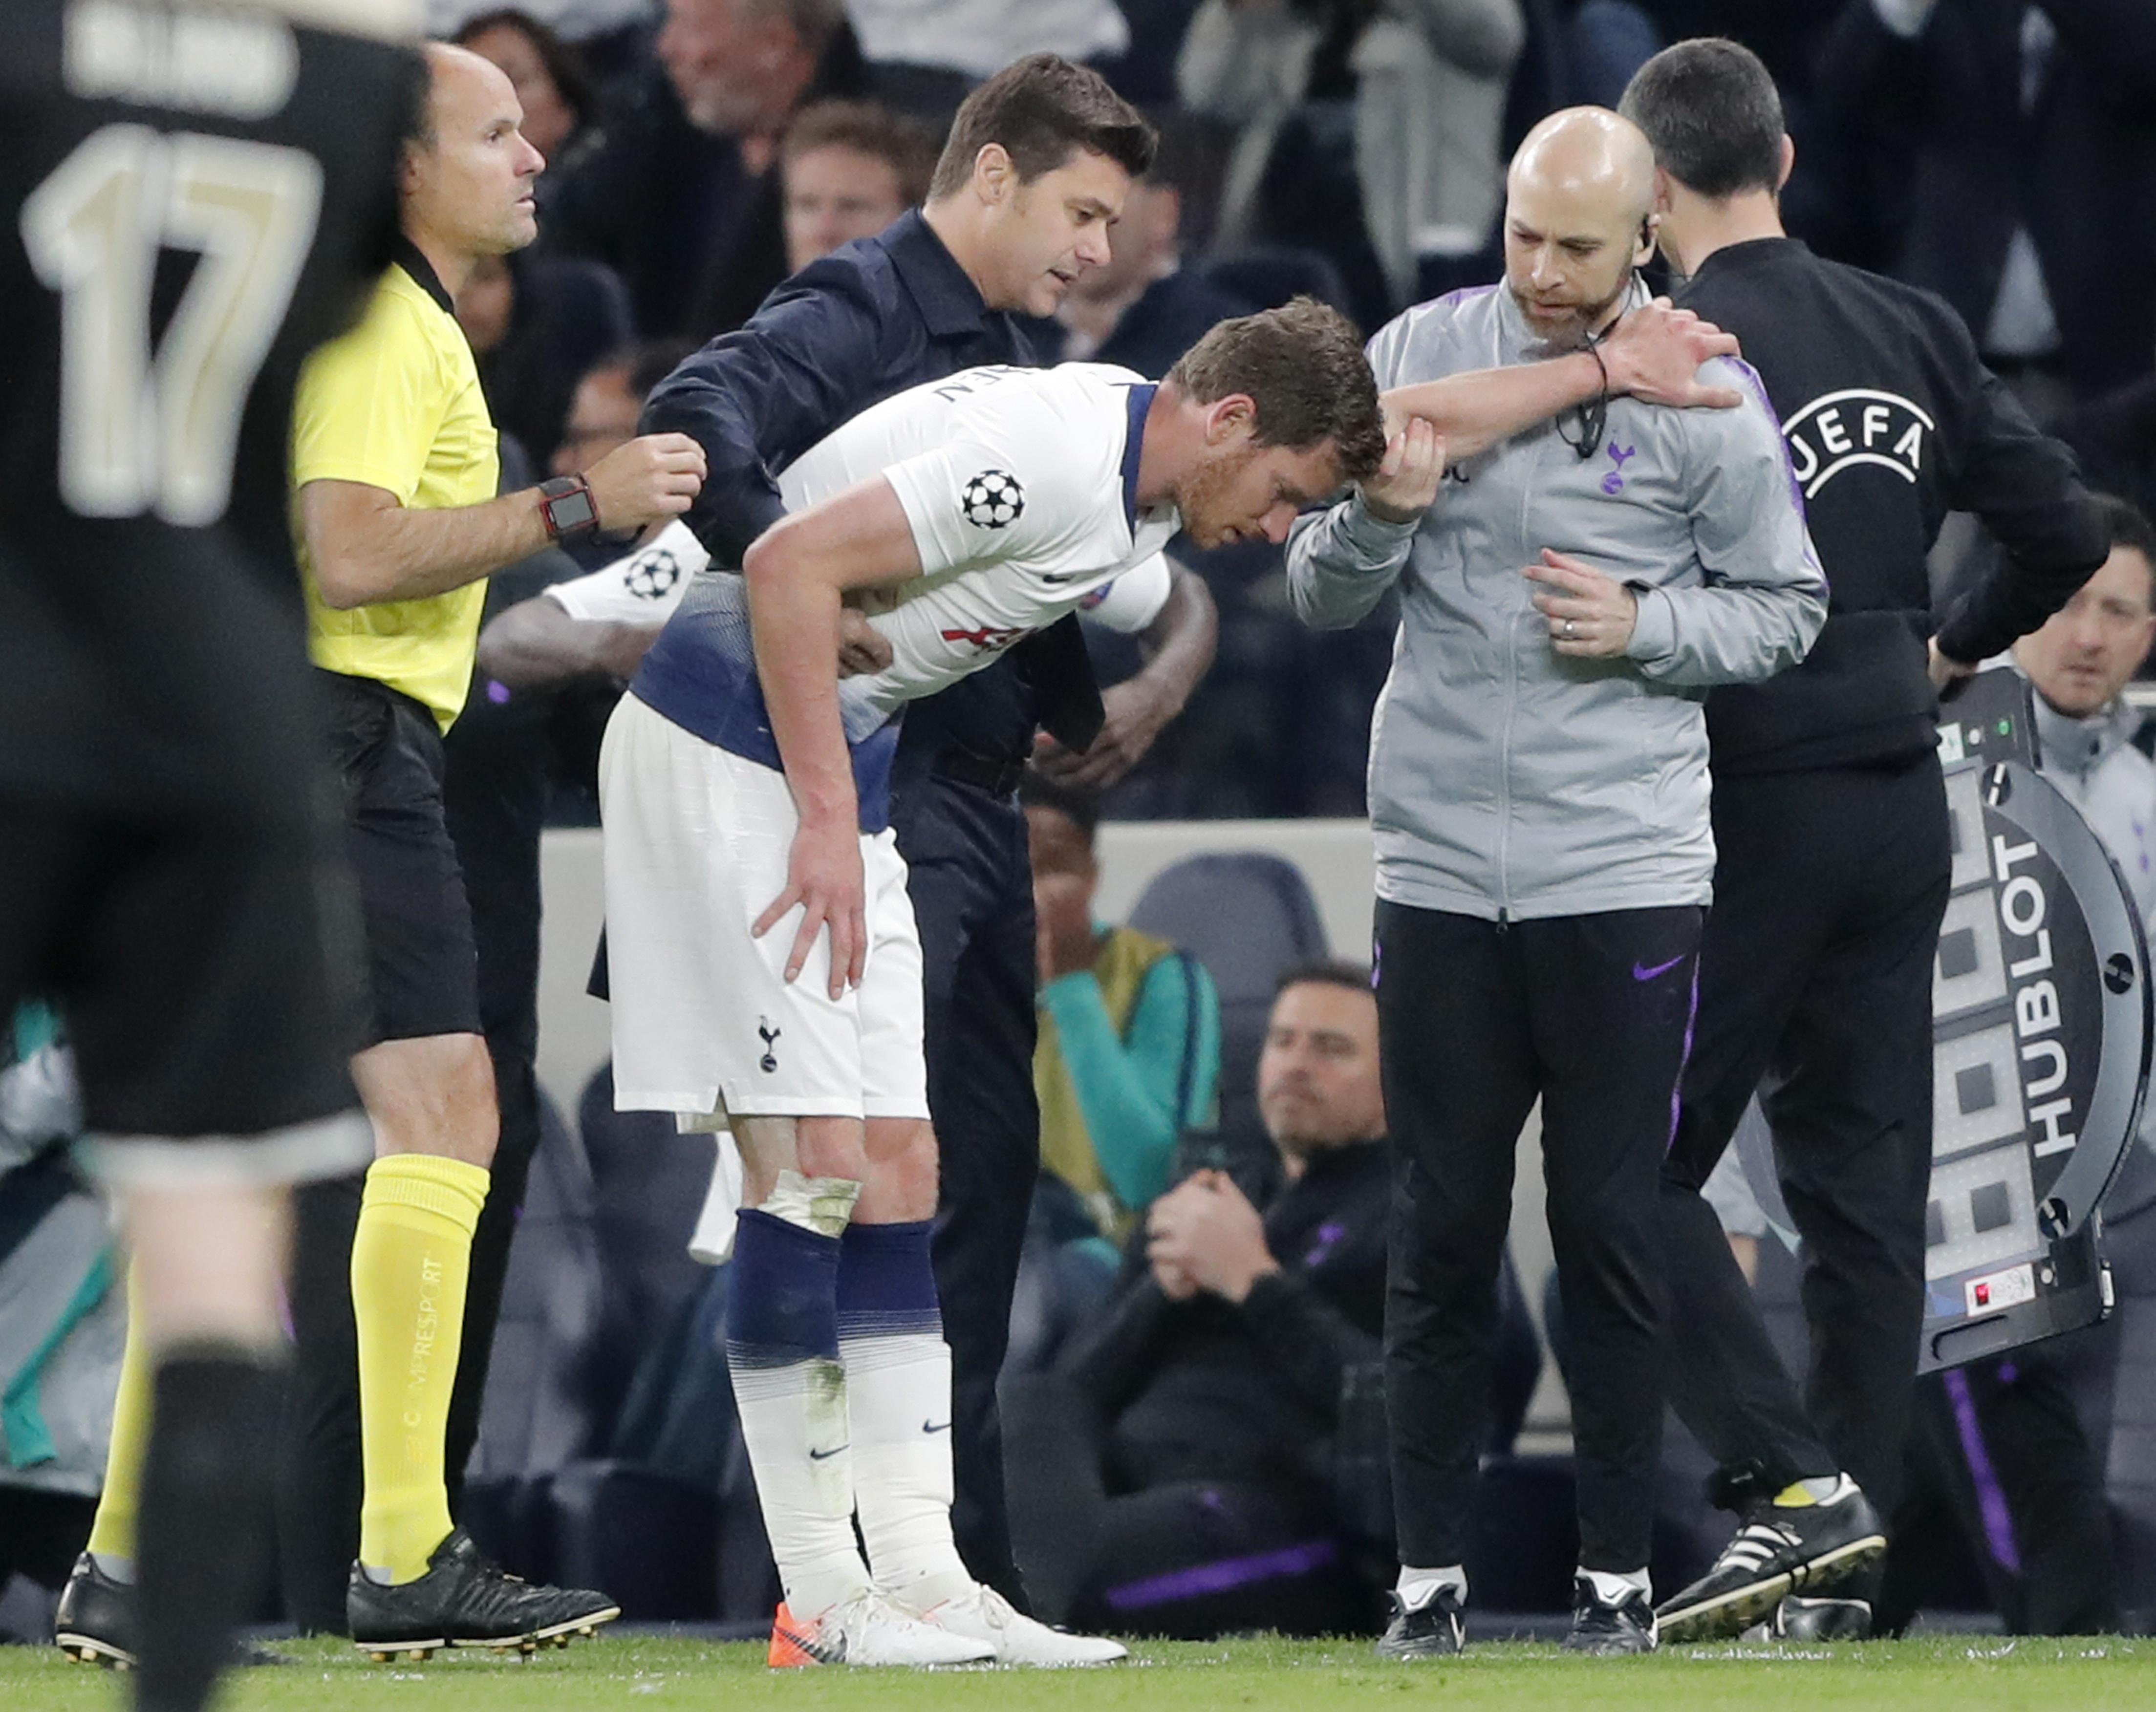 Tottenham's Vertonghen forced off after clash of heads